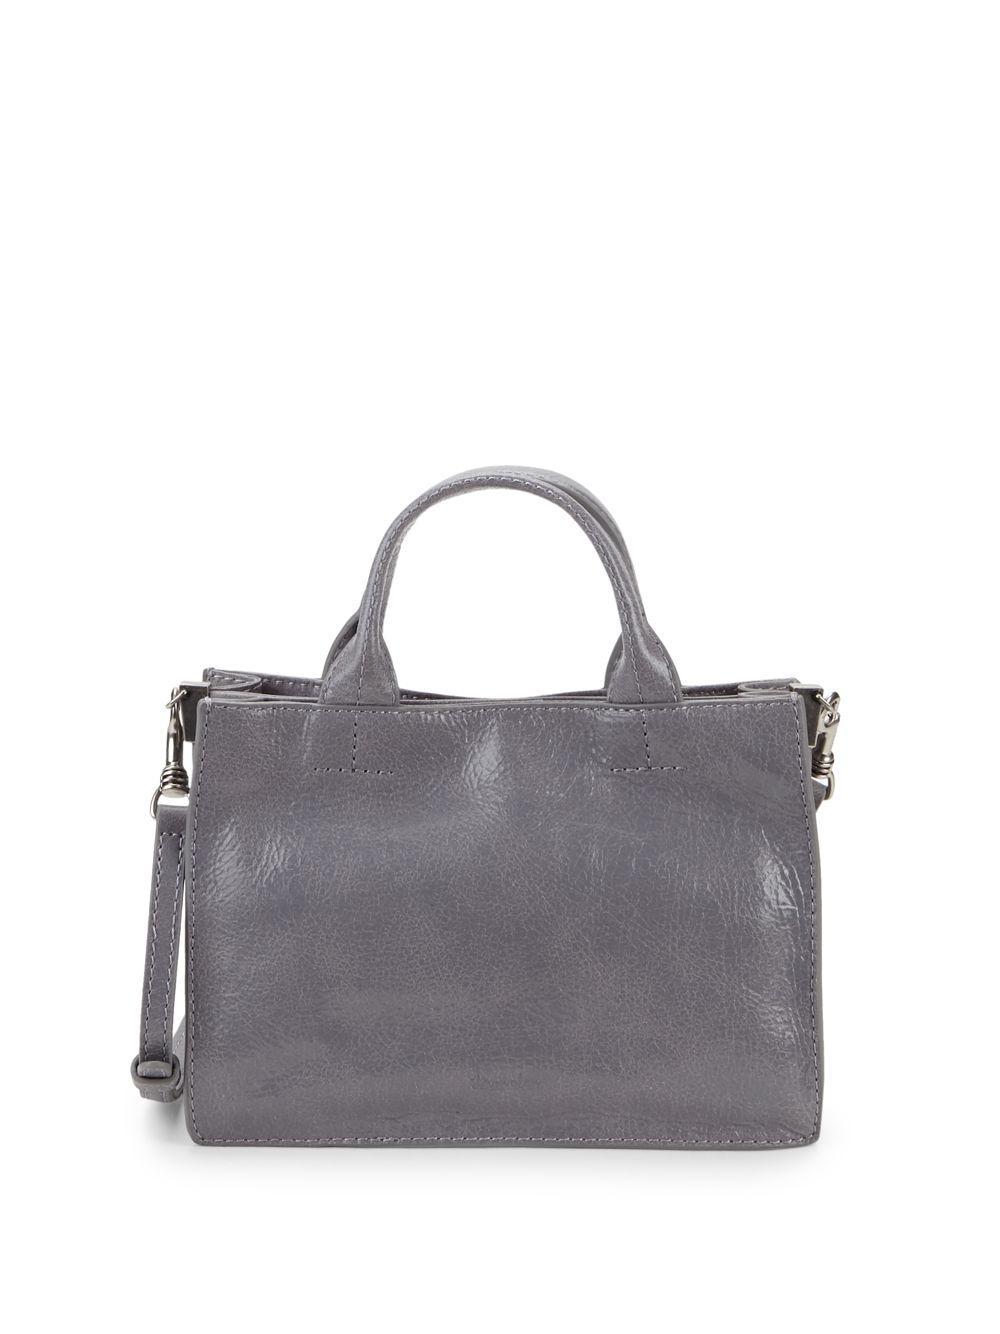 a651201e9c02 Steven Alan Classic Leather Crossbody Bag in Gray - Lyst